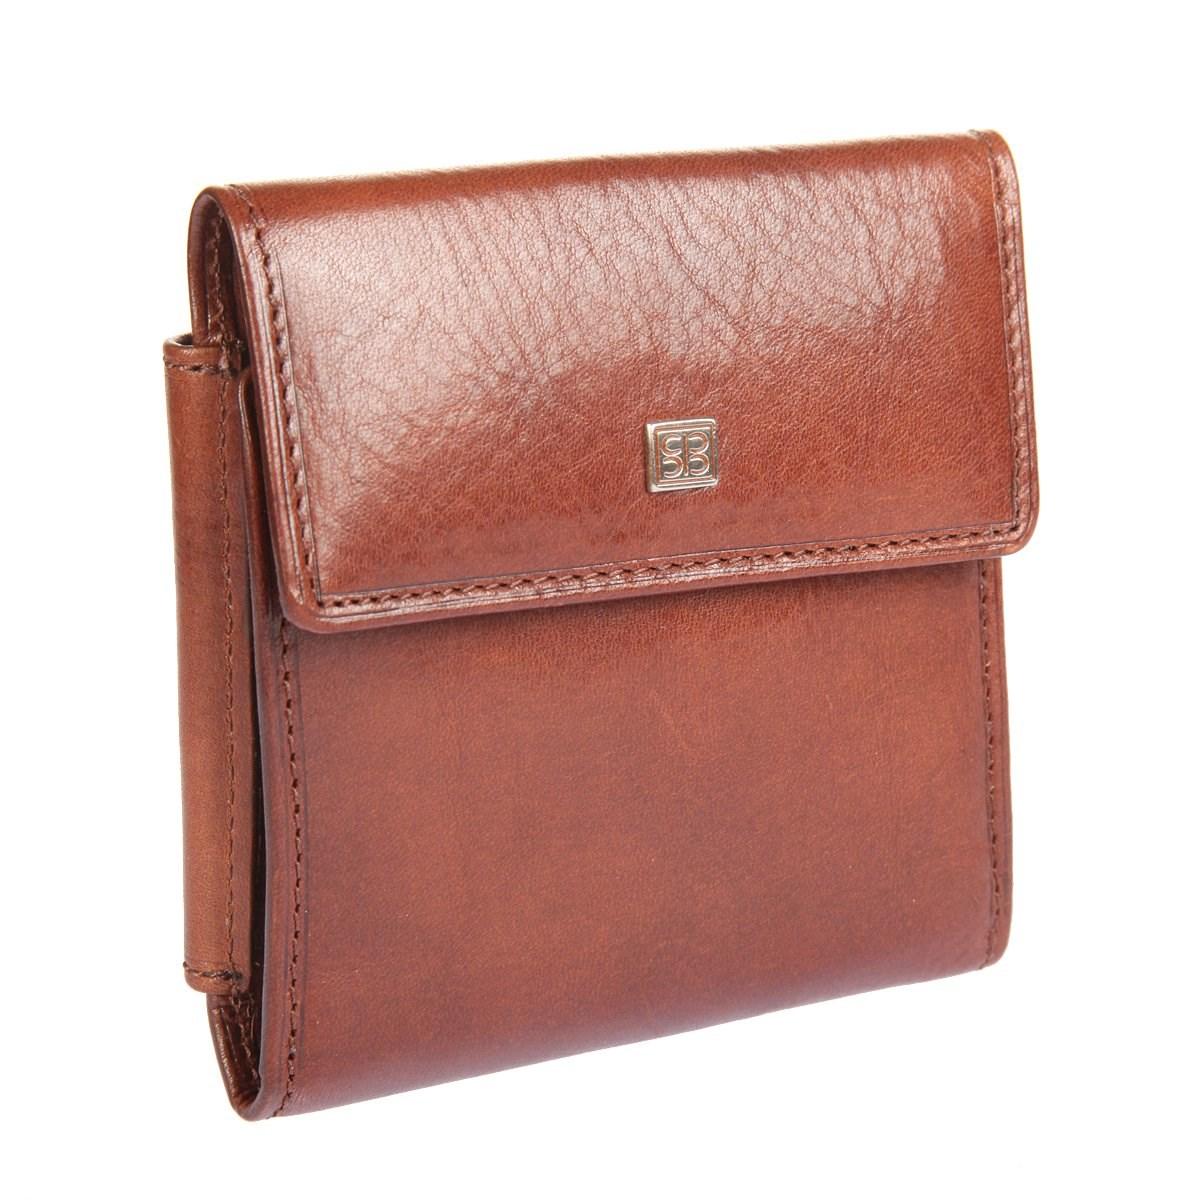 Coin Purse Sergio Belotti 3410 Oro Brown simple retro split leather coin purse w belt buckle brown